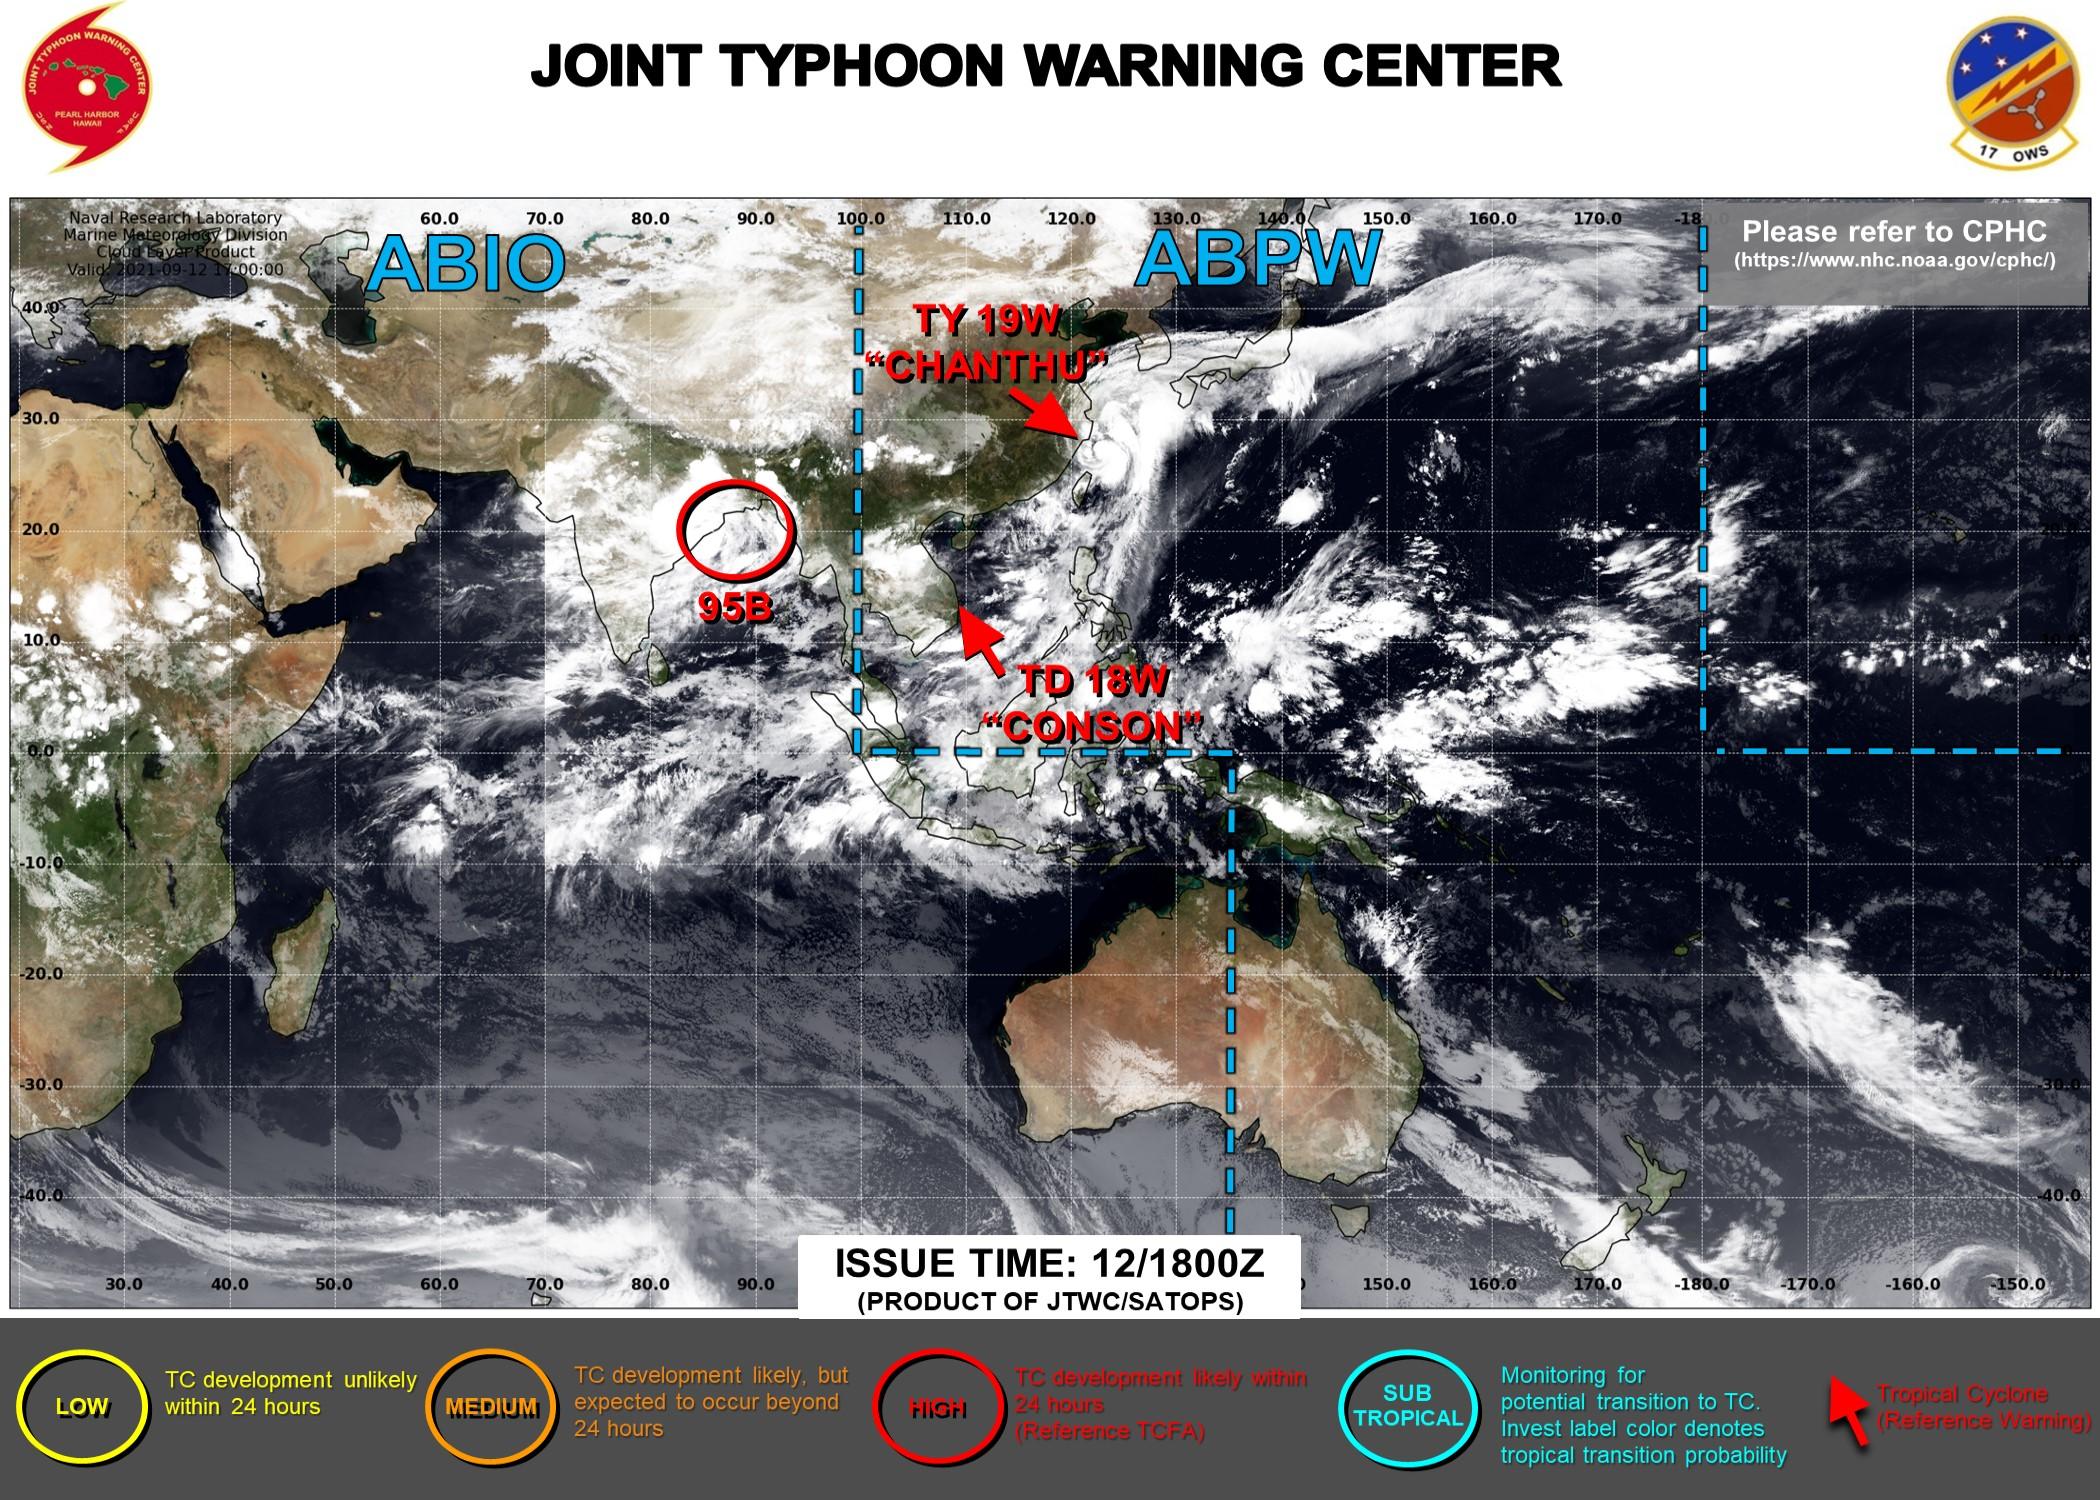 Western Pacific: 19W(CHANTHU) CAT 2 weakening gradually,18W(CONSON): final warning// Invest 95B: intensity near 35knots, 12/21utc updates